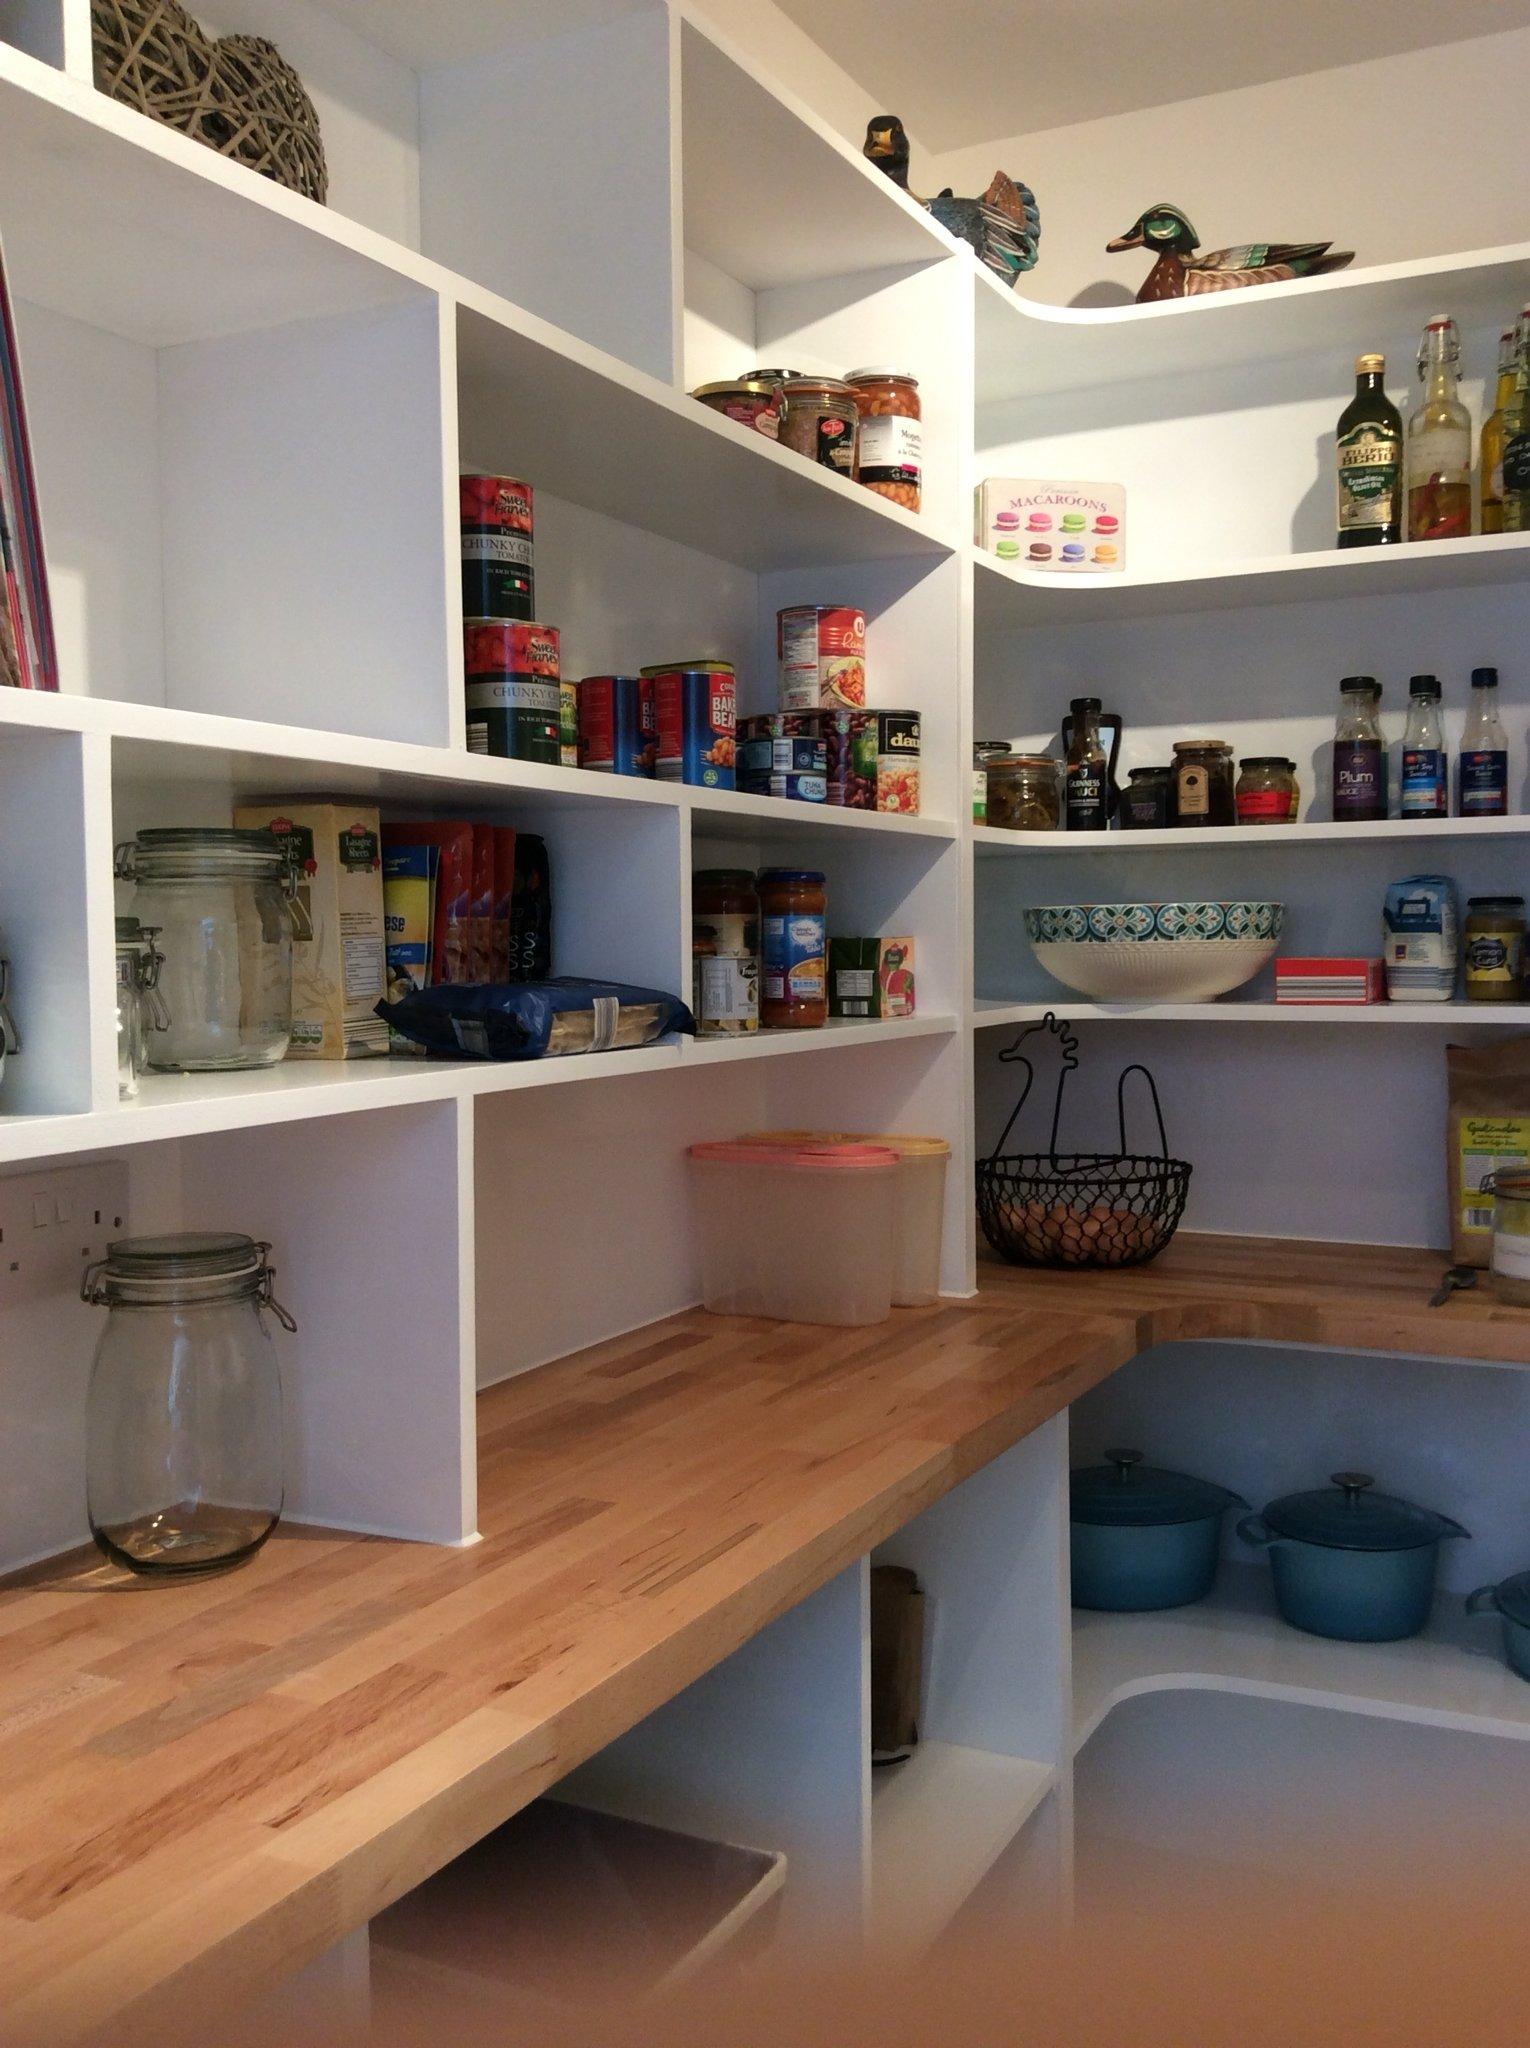 10 Ideal Walk In Pantry Shelving Ideas walk in pantry shelving secret shelves 2020